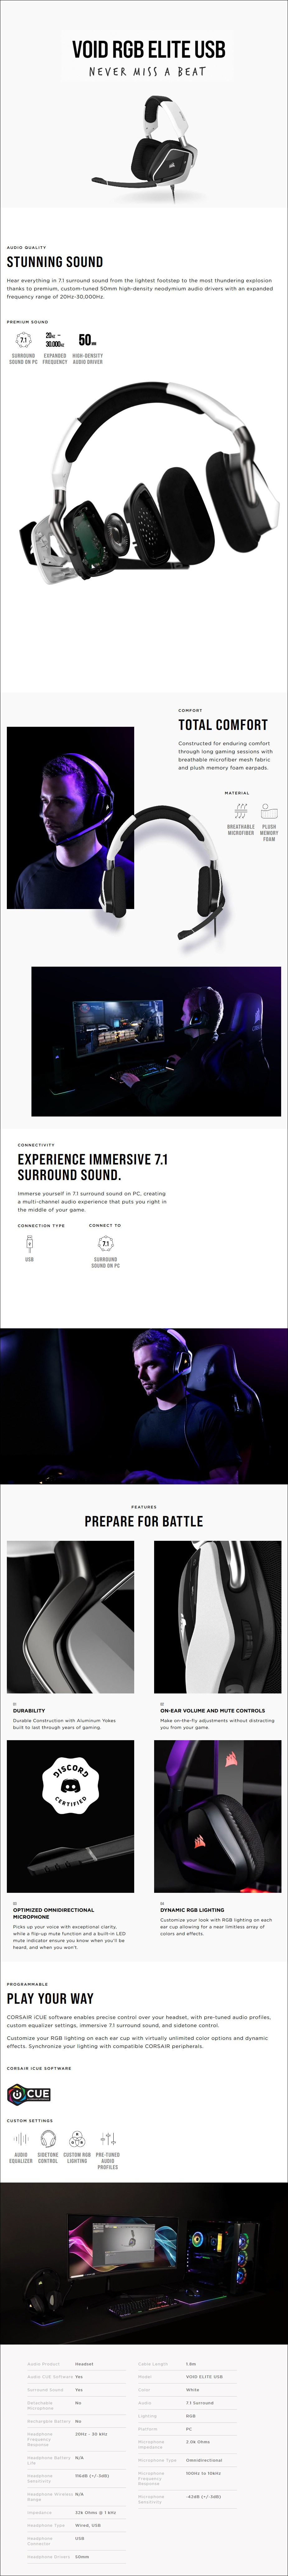 Corsair Gaming Elite USB RGB Gaming Headset - White - Overview 1